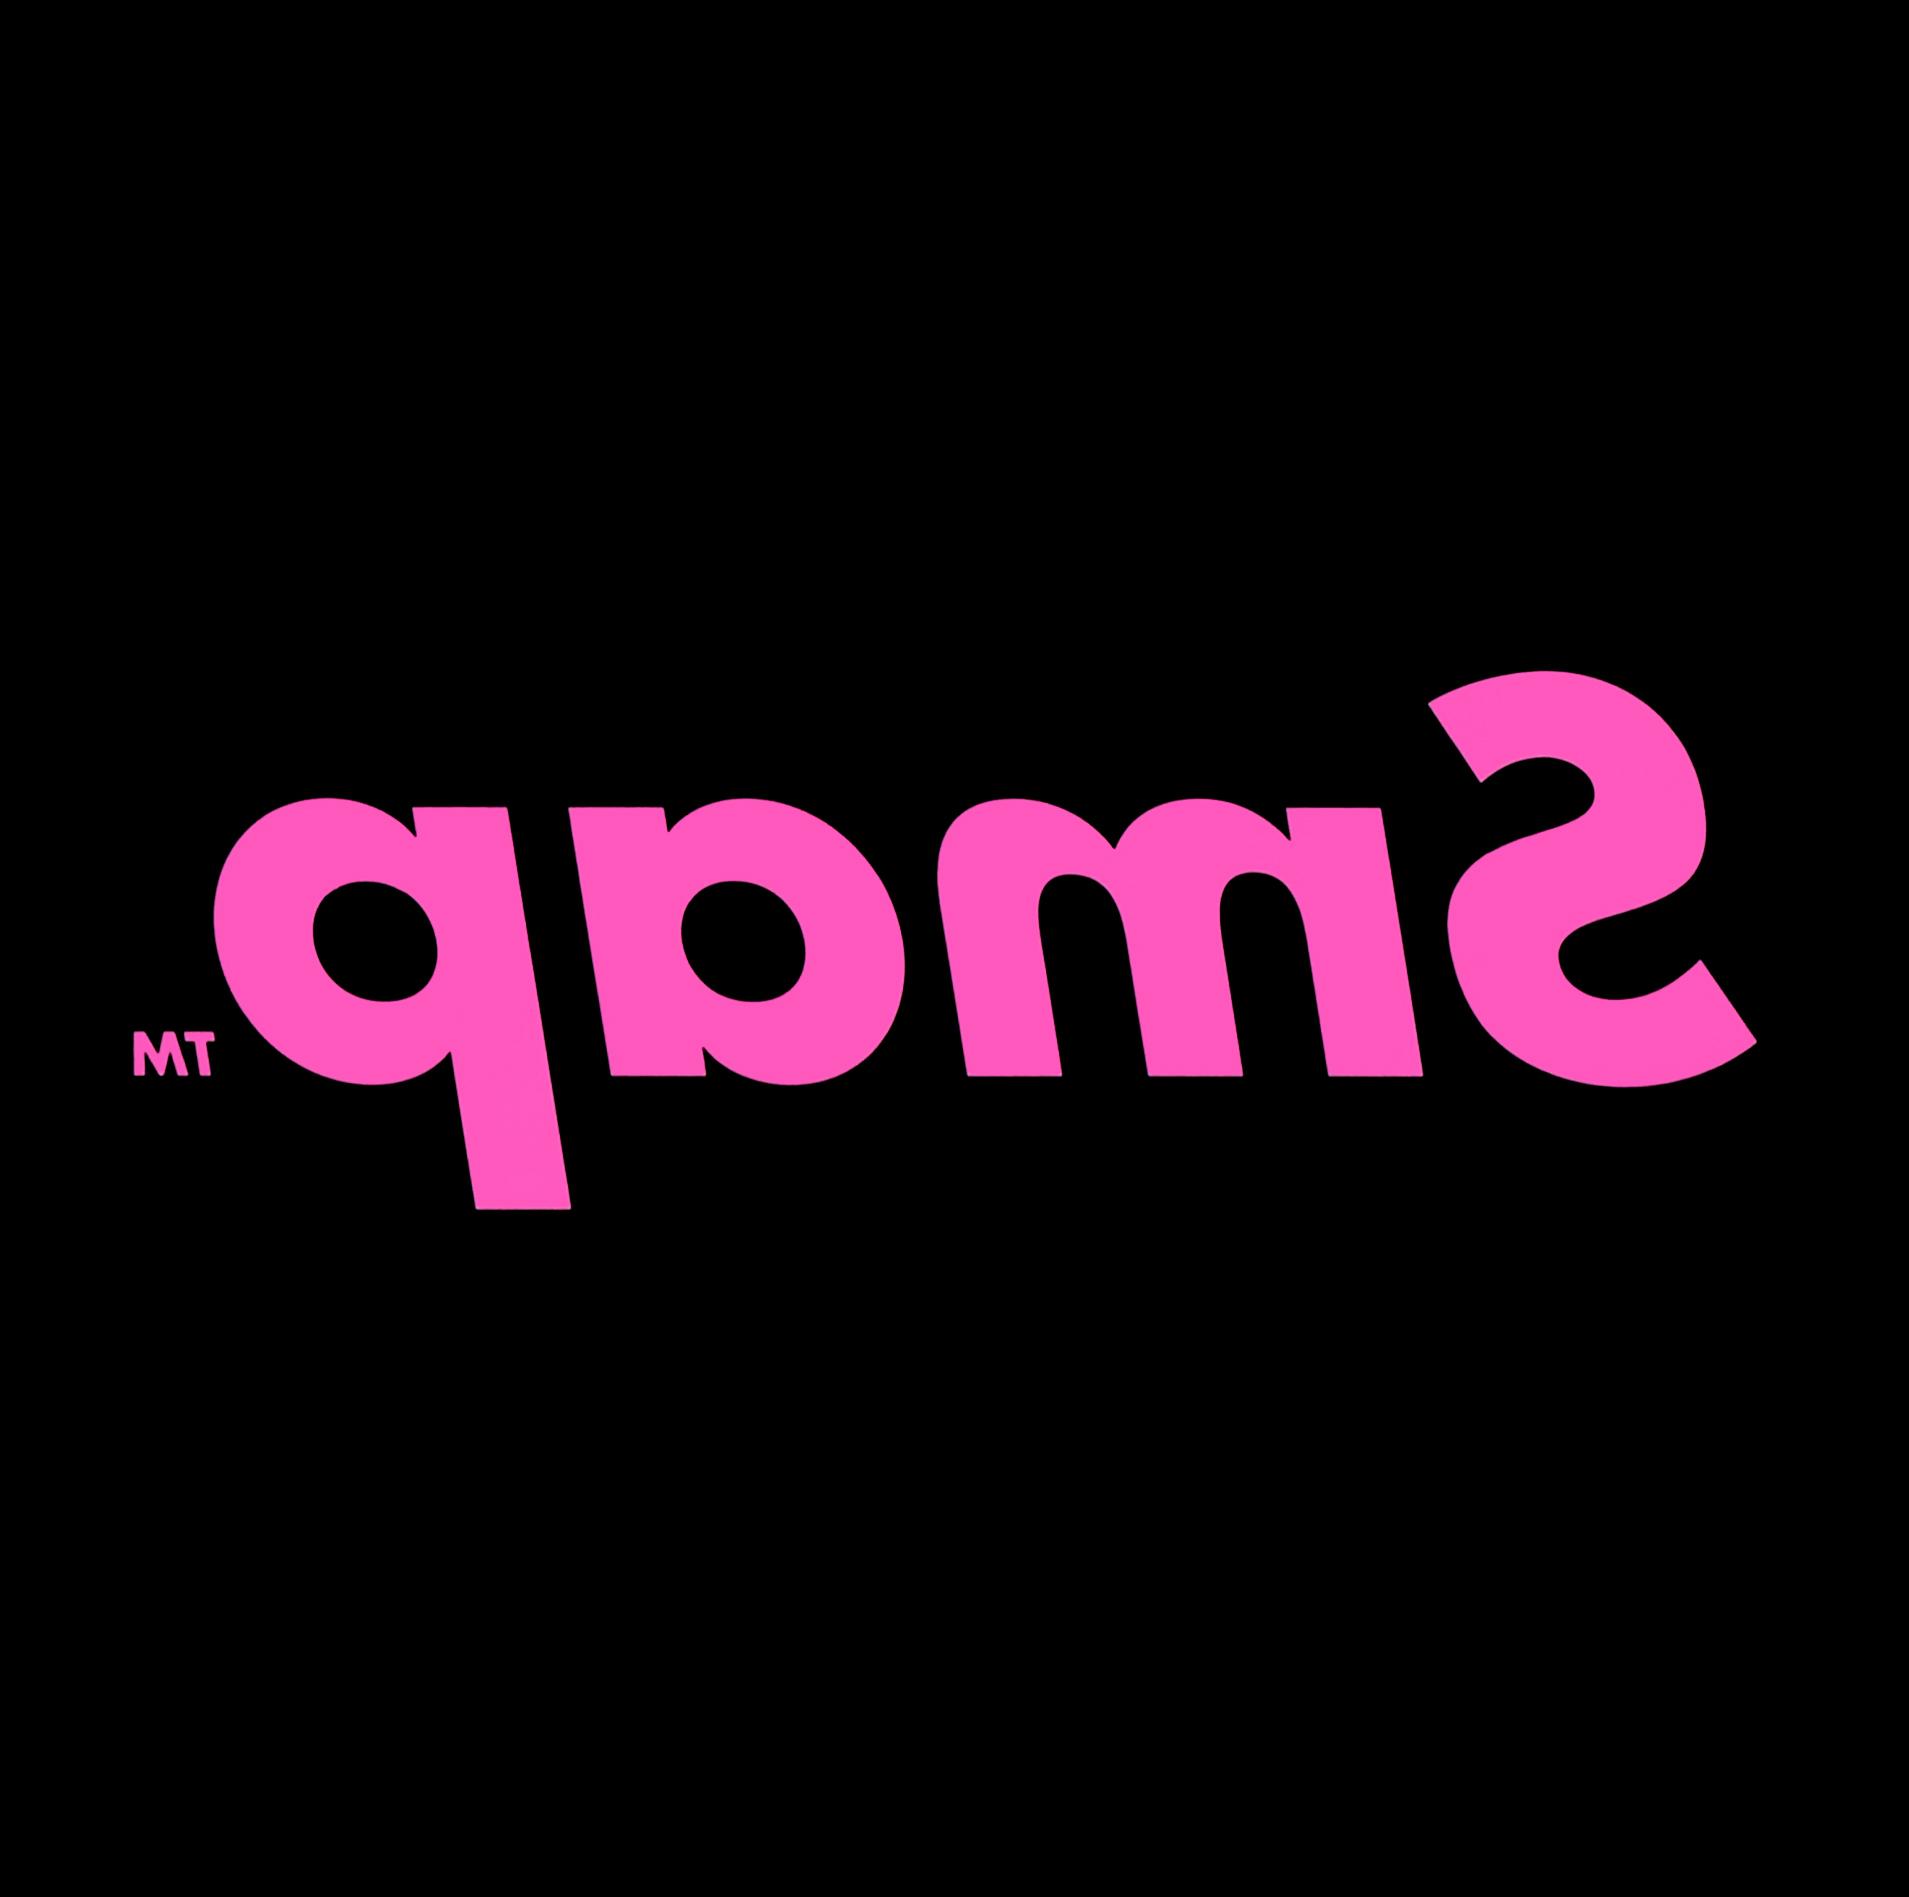 SMAP (スマップ) 裏ベスト・アルバム『qɒmƧ (ウラスマ)』(2001年8月8日発売) 高画質CDジャケット画像 ジャケ写